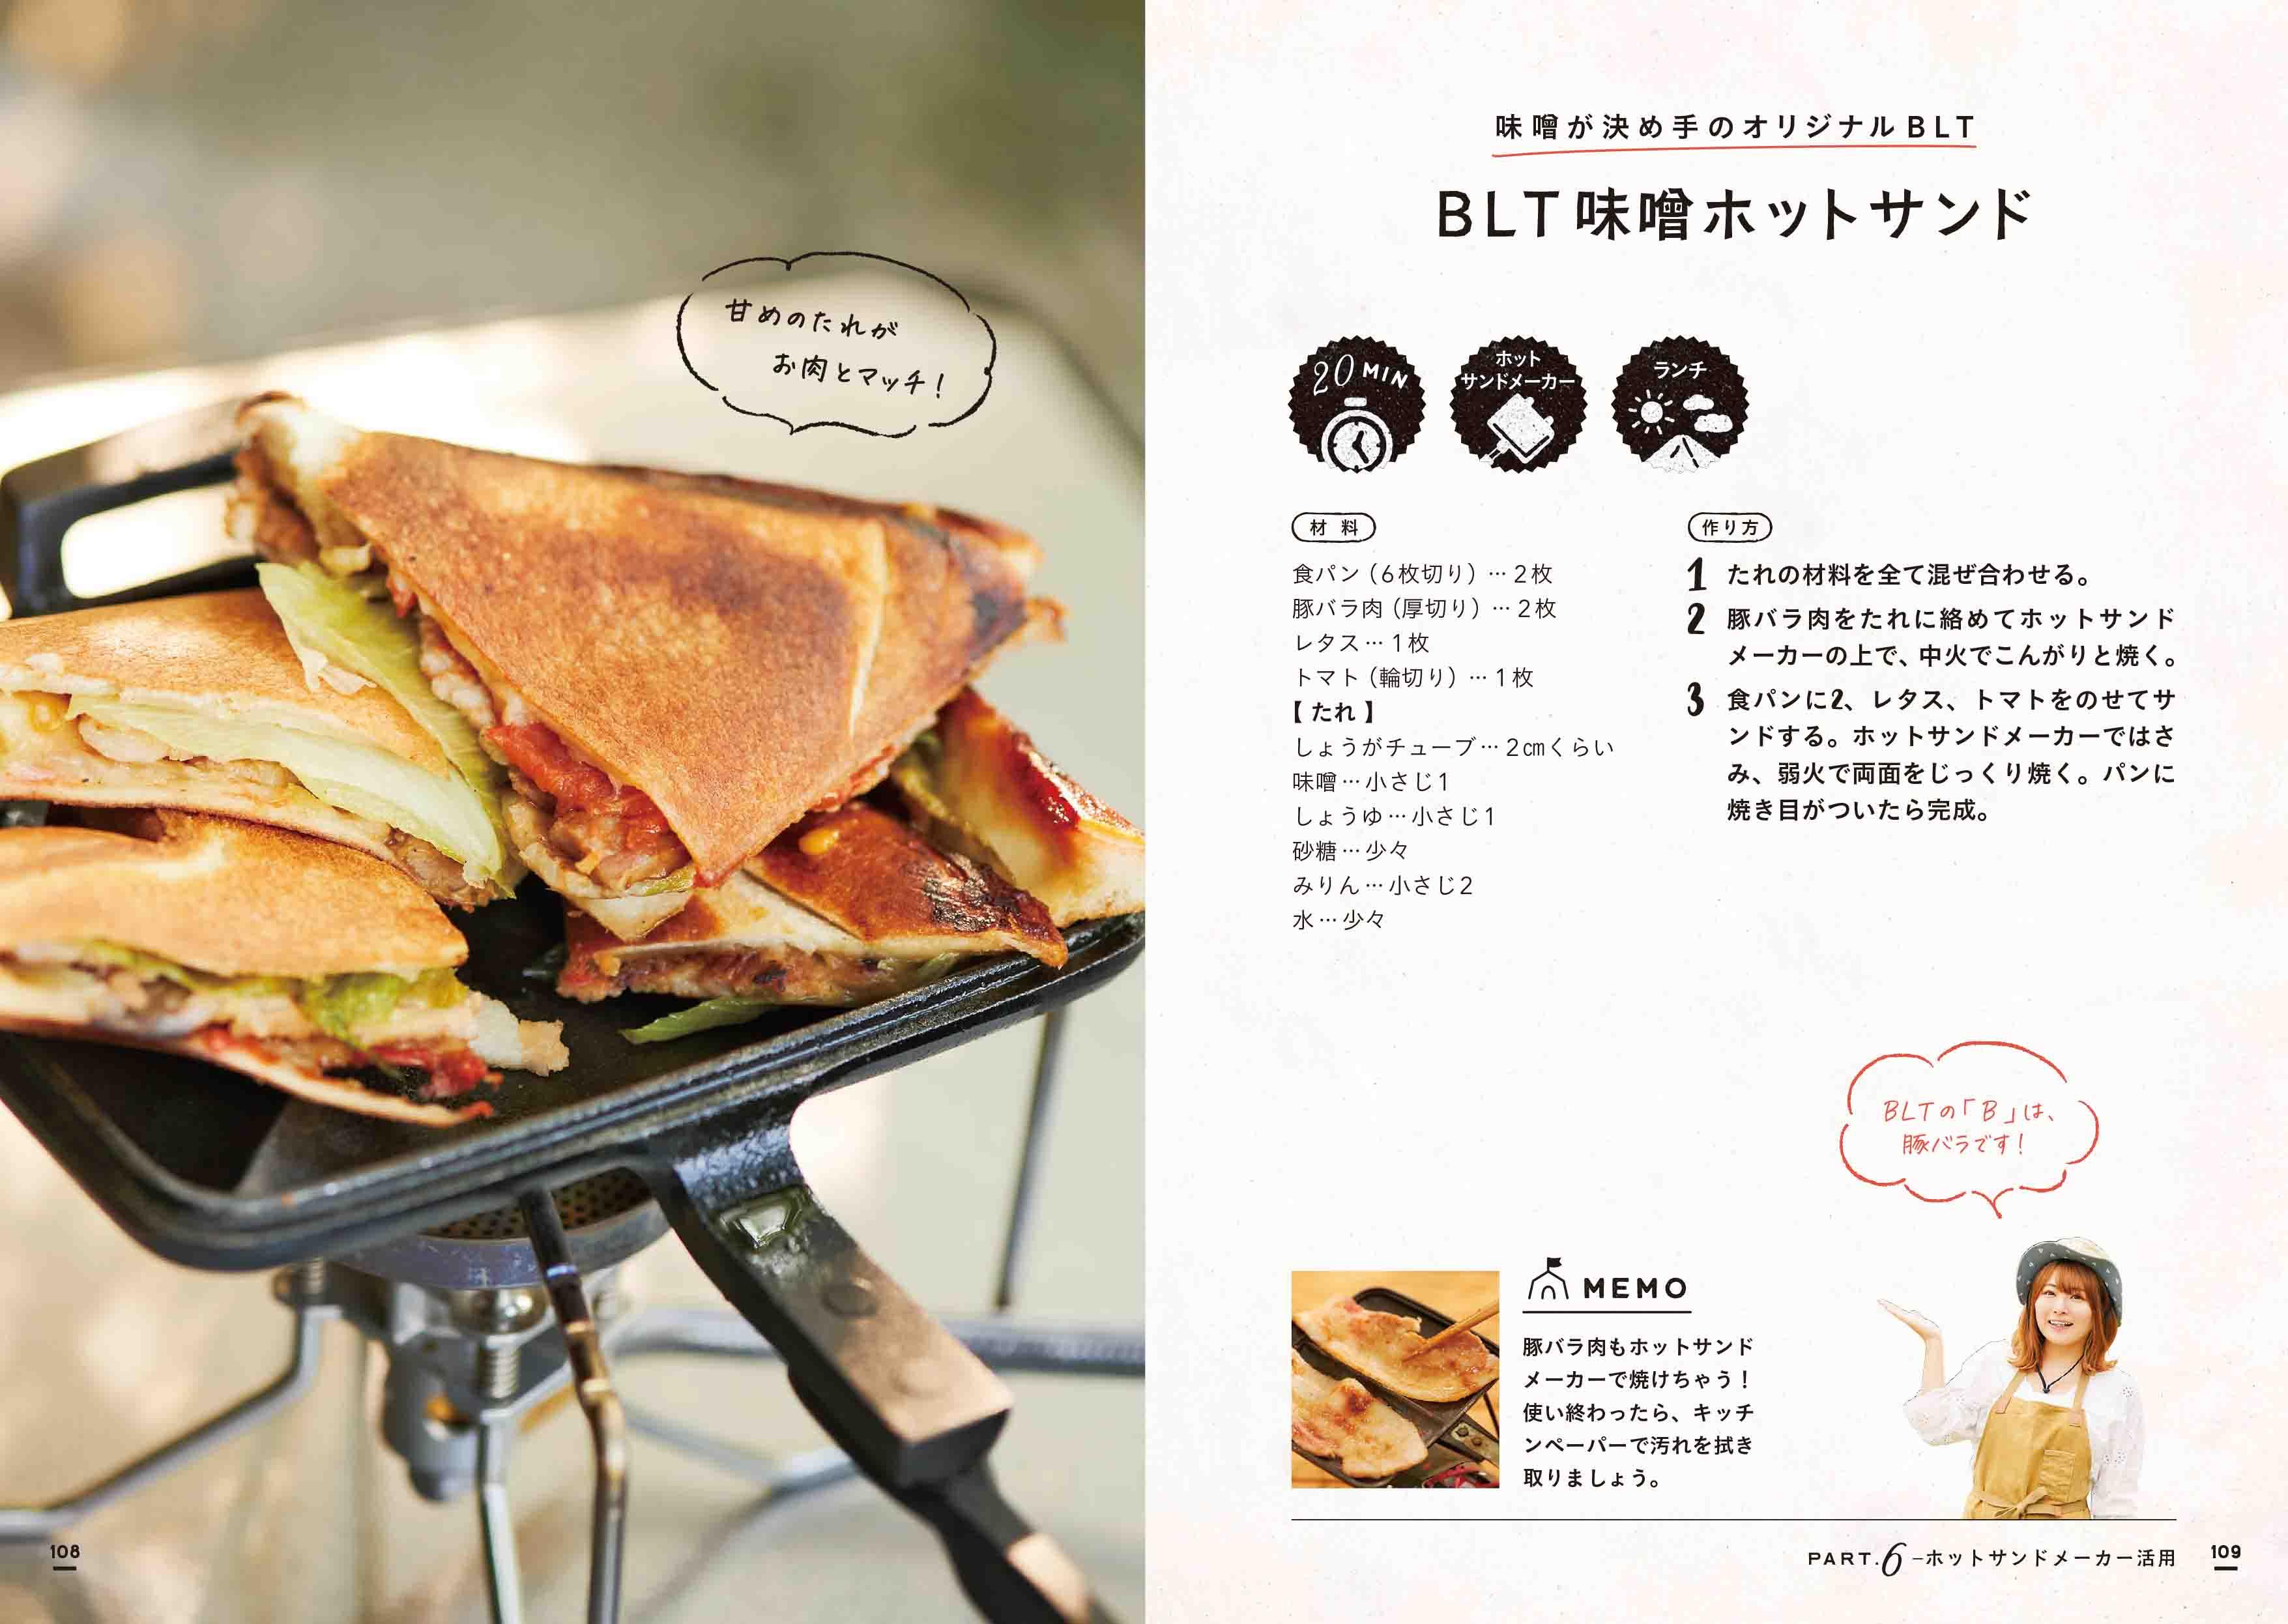 「BLT味噌ホットサンド」紙面